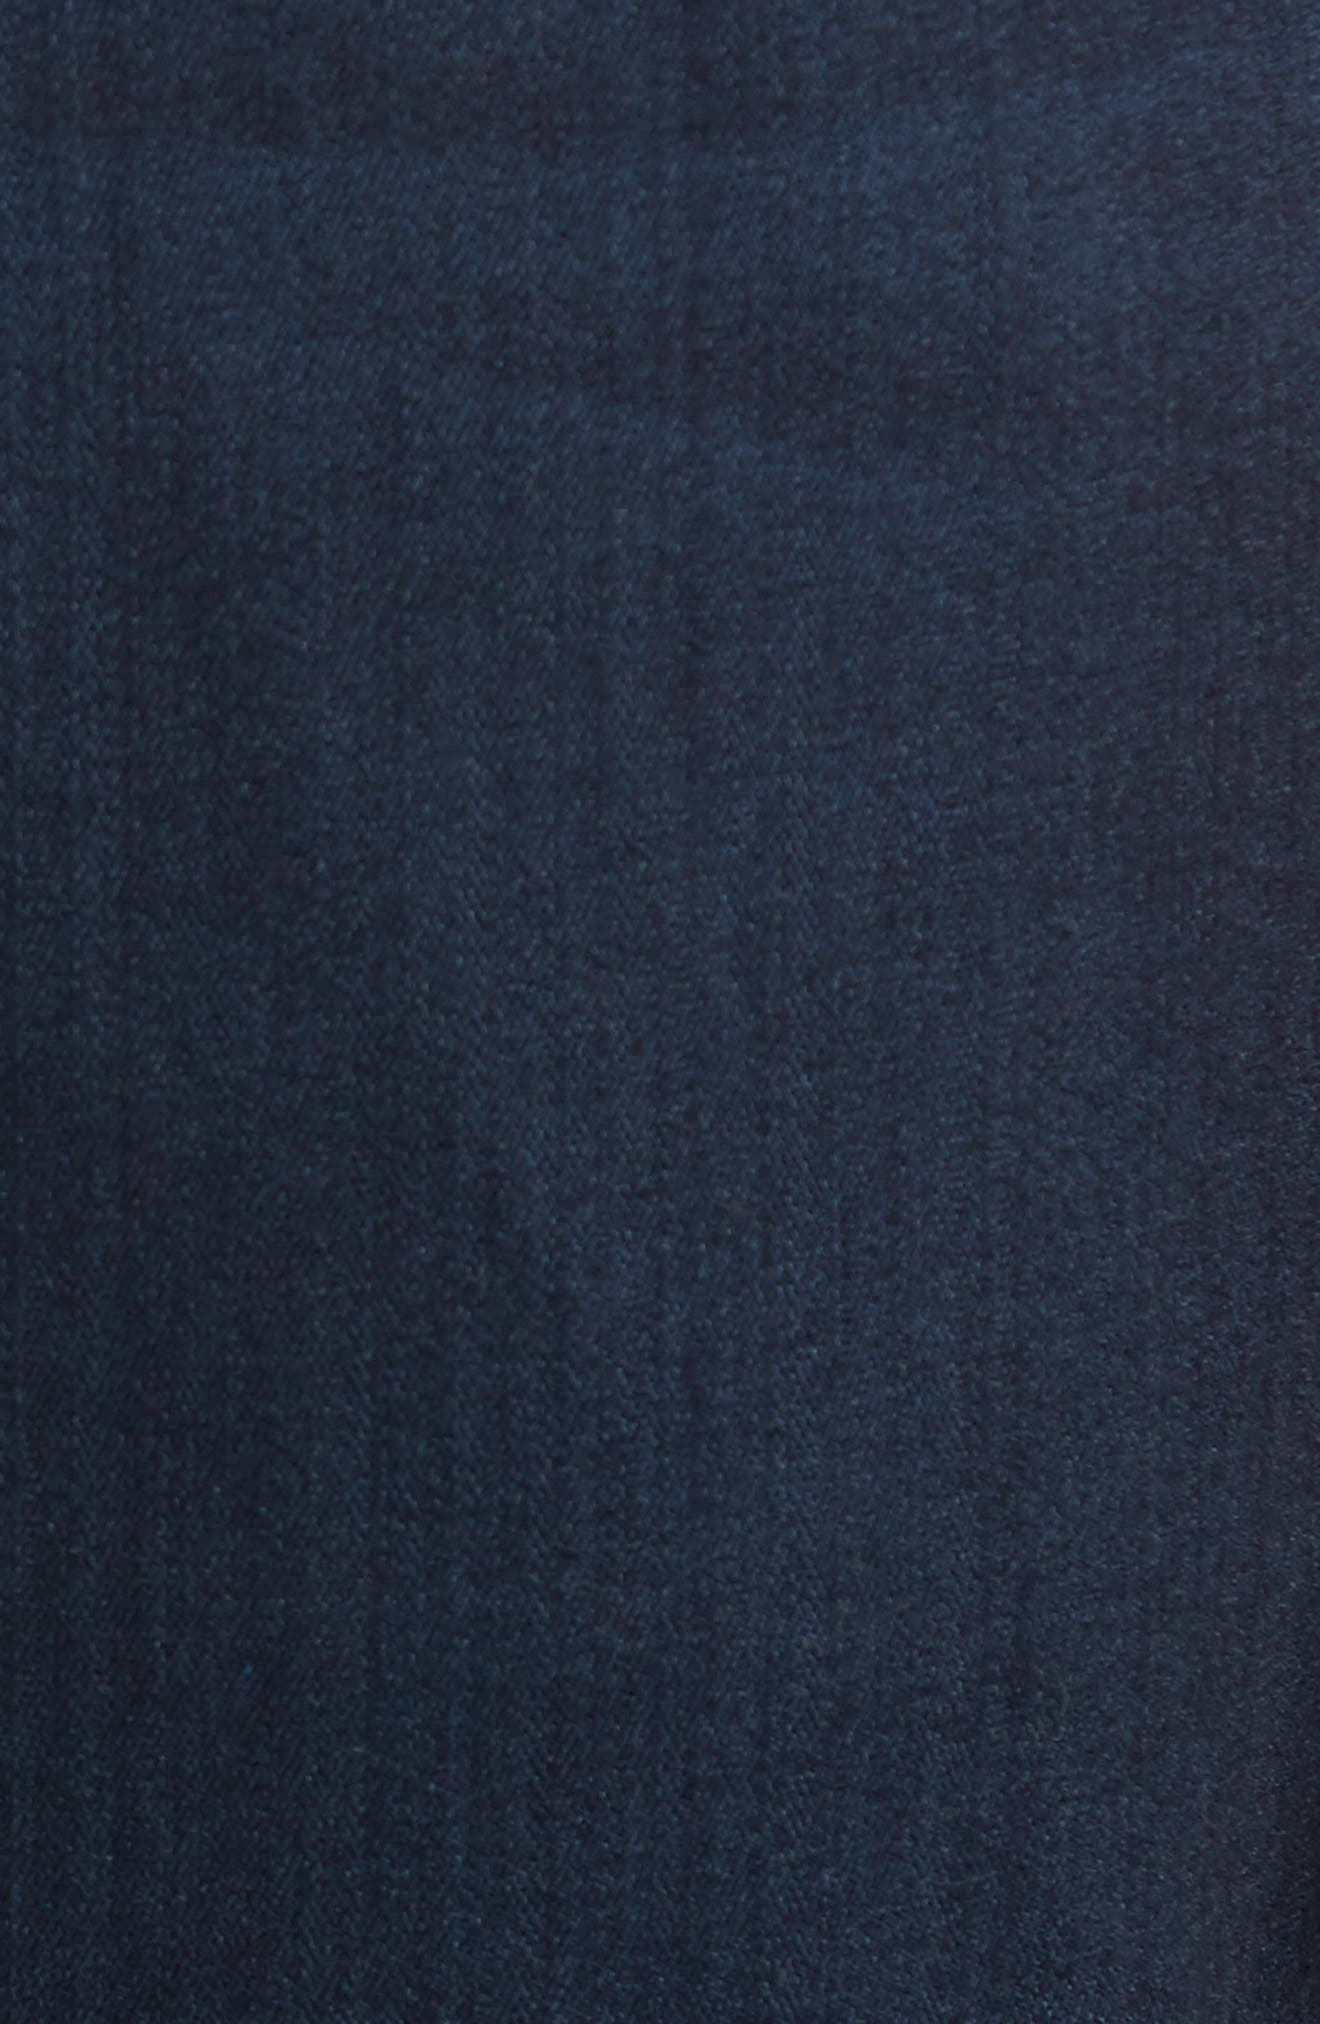 Normandie Straight Leg Jeans,                             Alternate thumbnail 5, color,                             ARLO